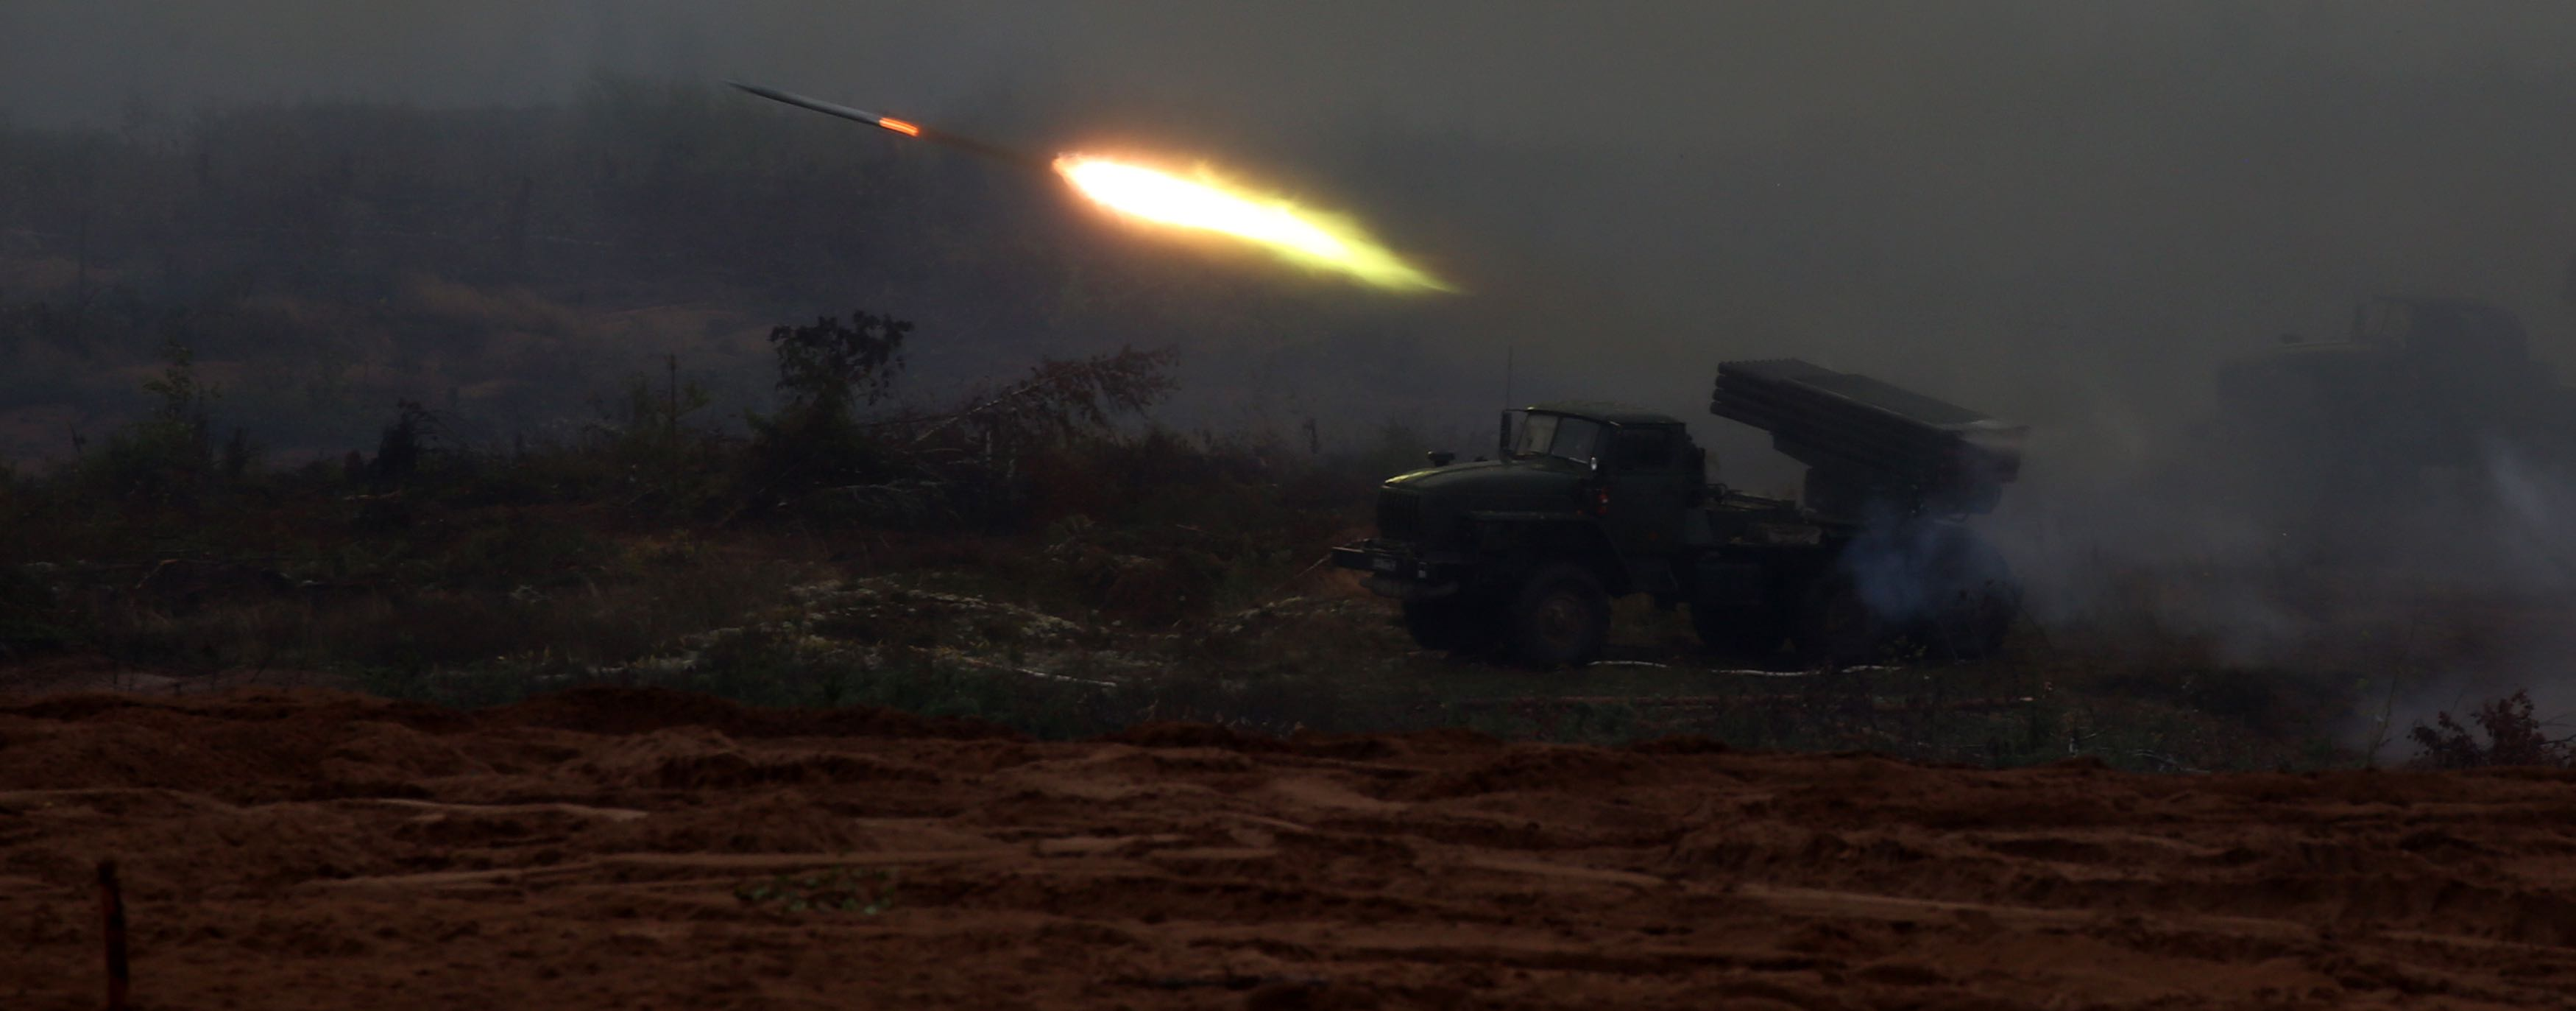 Russian military exercise at Luzhsky range near Saint Petersburg, Russia, in September (Photo: Mikhail Svetlov/Getty)